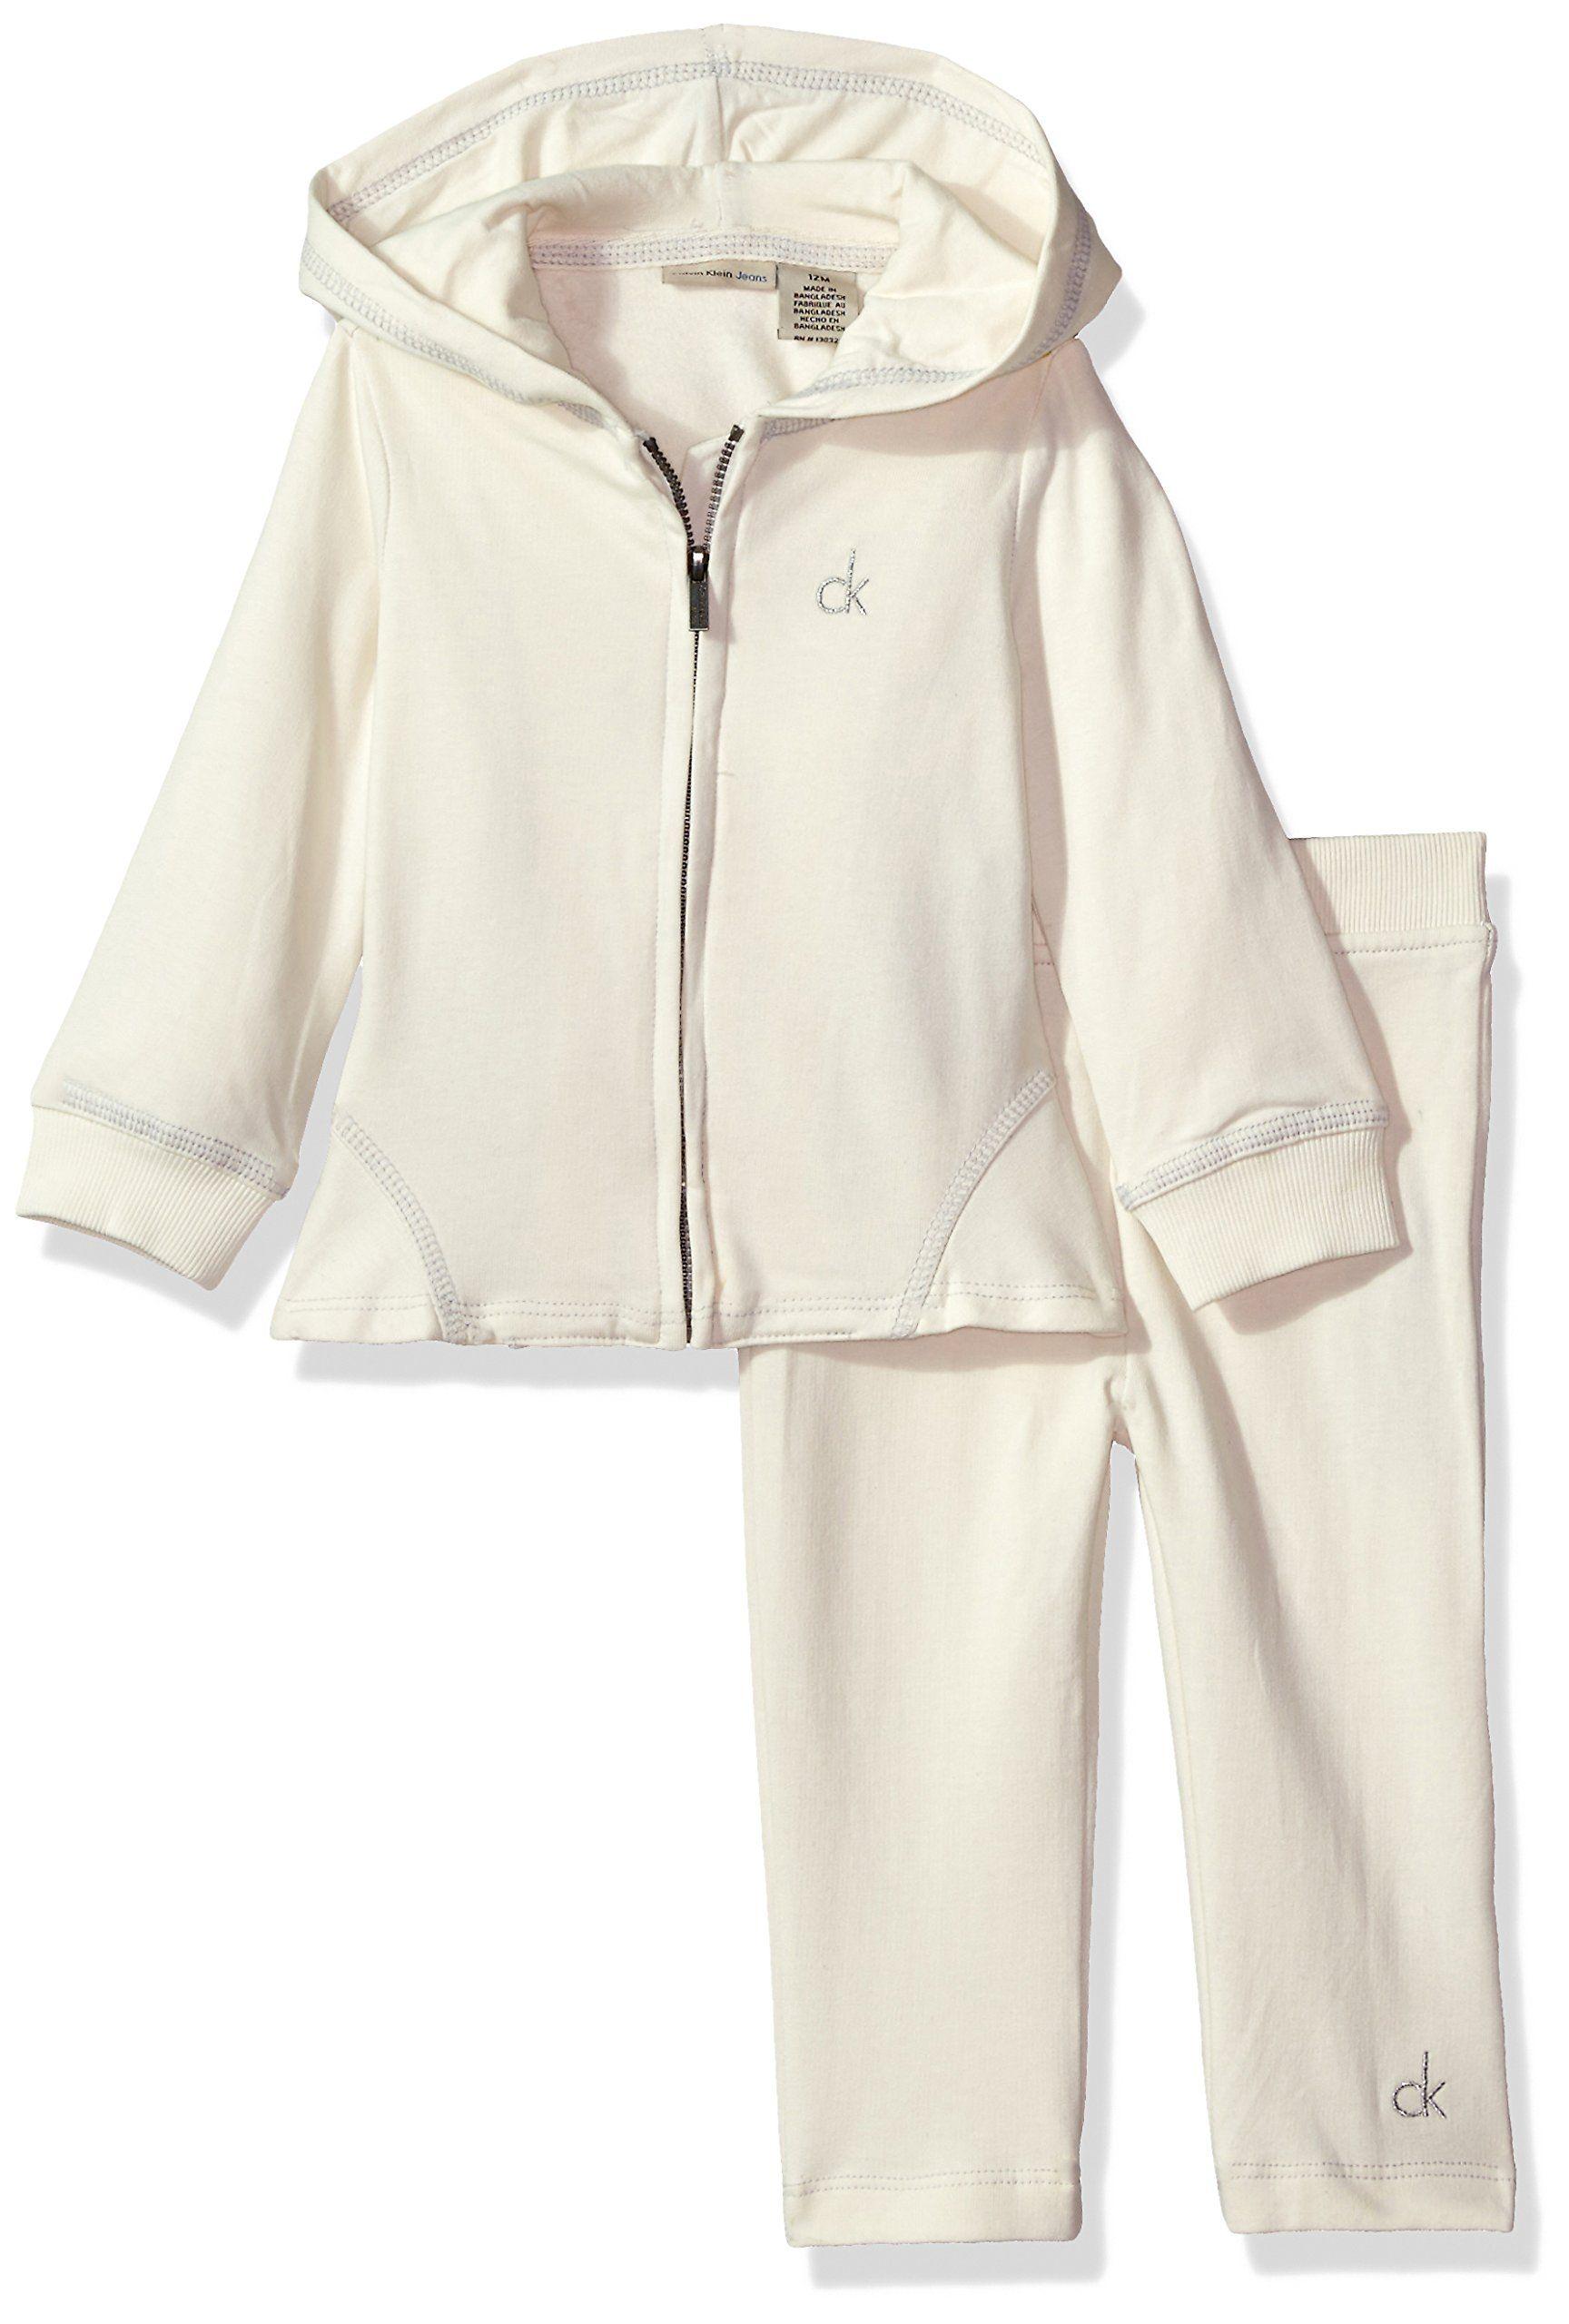 da47d09069ac Calvin Klein Baby Fleece Jacket with Pants Set Snow 6 9 Months ...